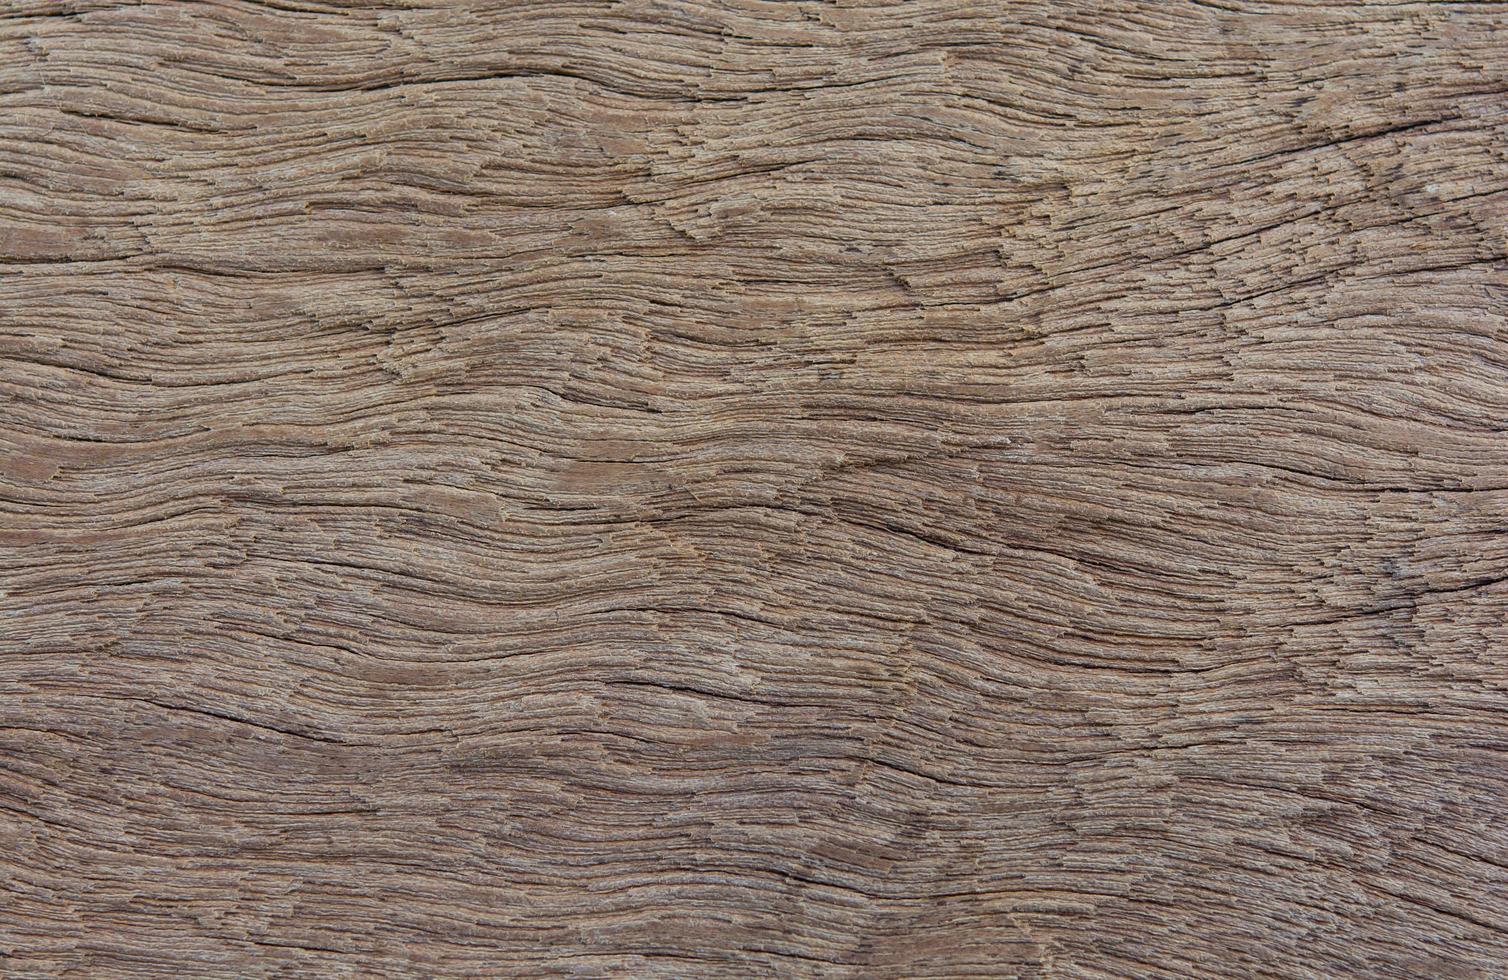 oude plank houtstructuur achtergrond foto